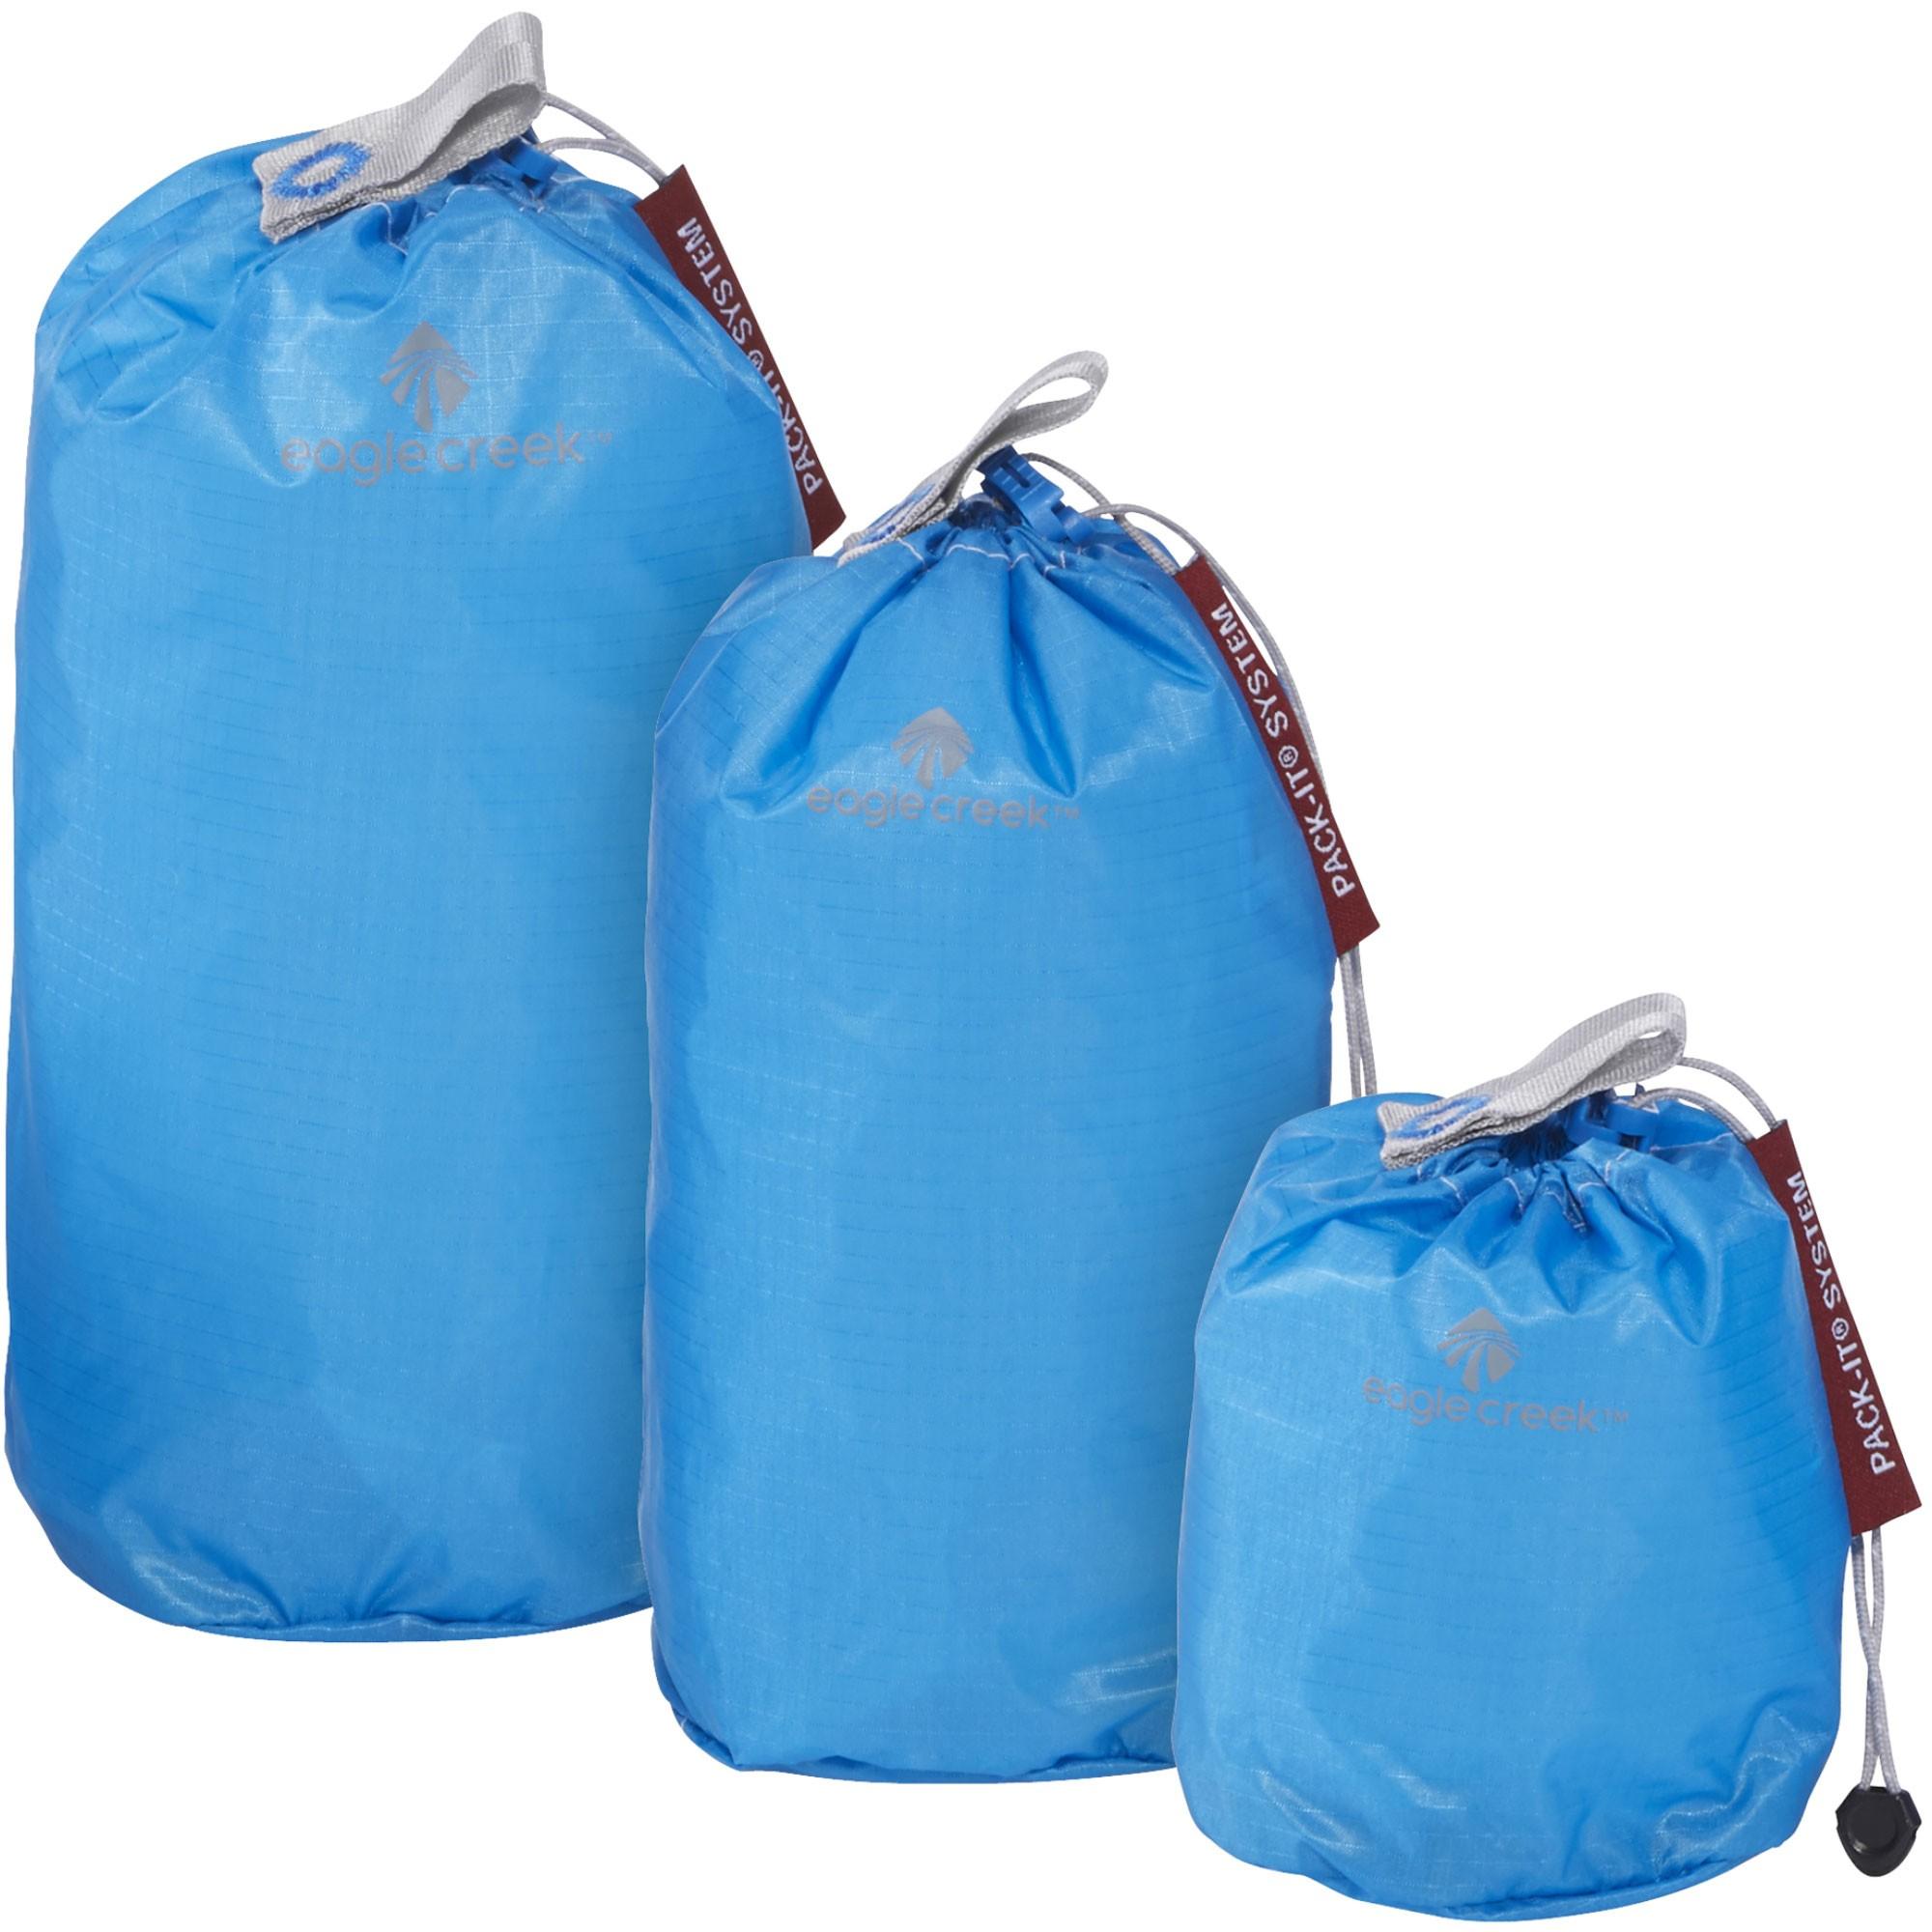 EAGLE CREEK - Pack-It Specter Stuffer Set Mini - Brilliant Blue